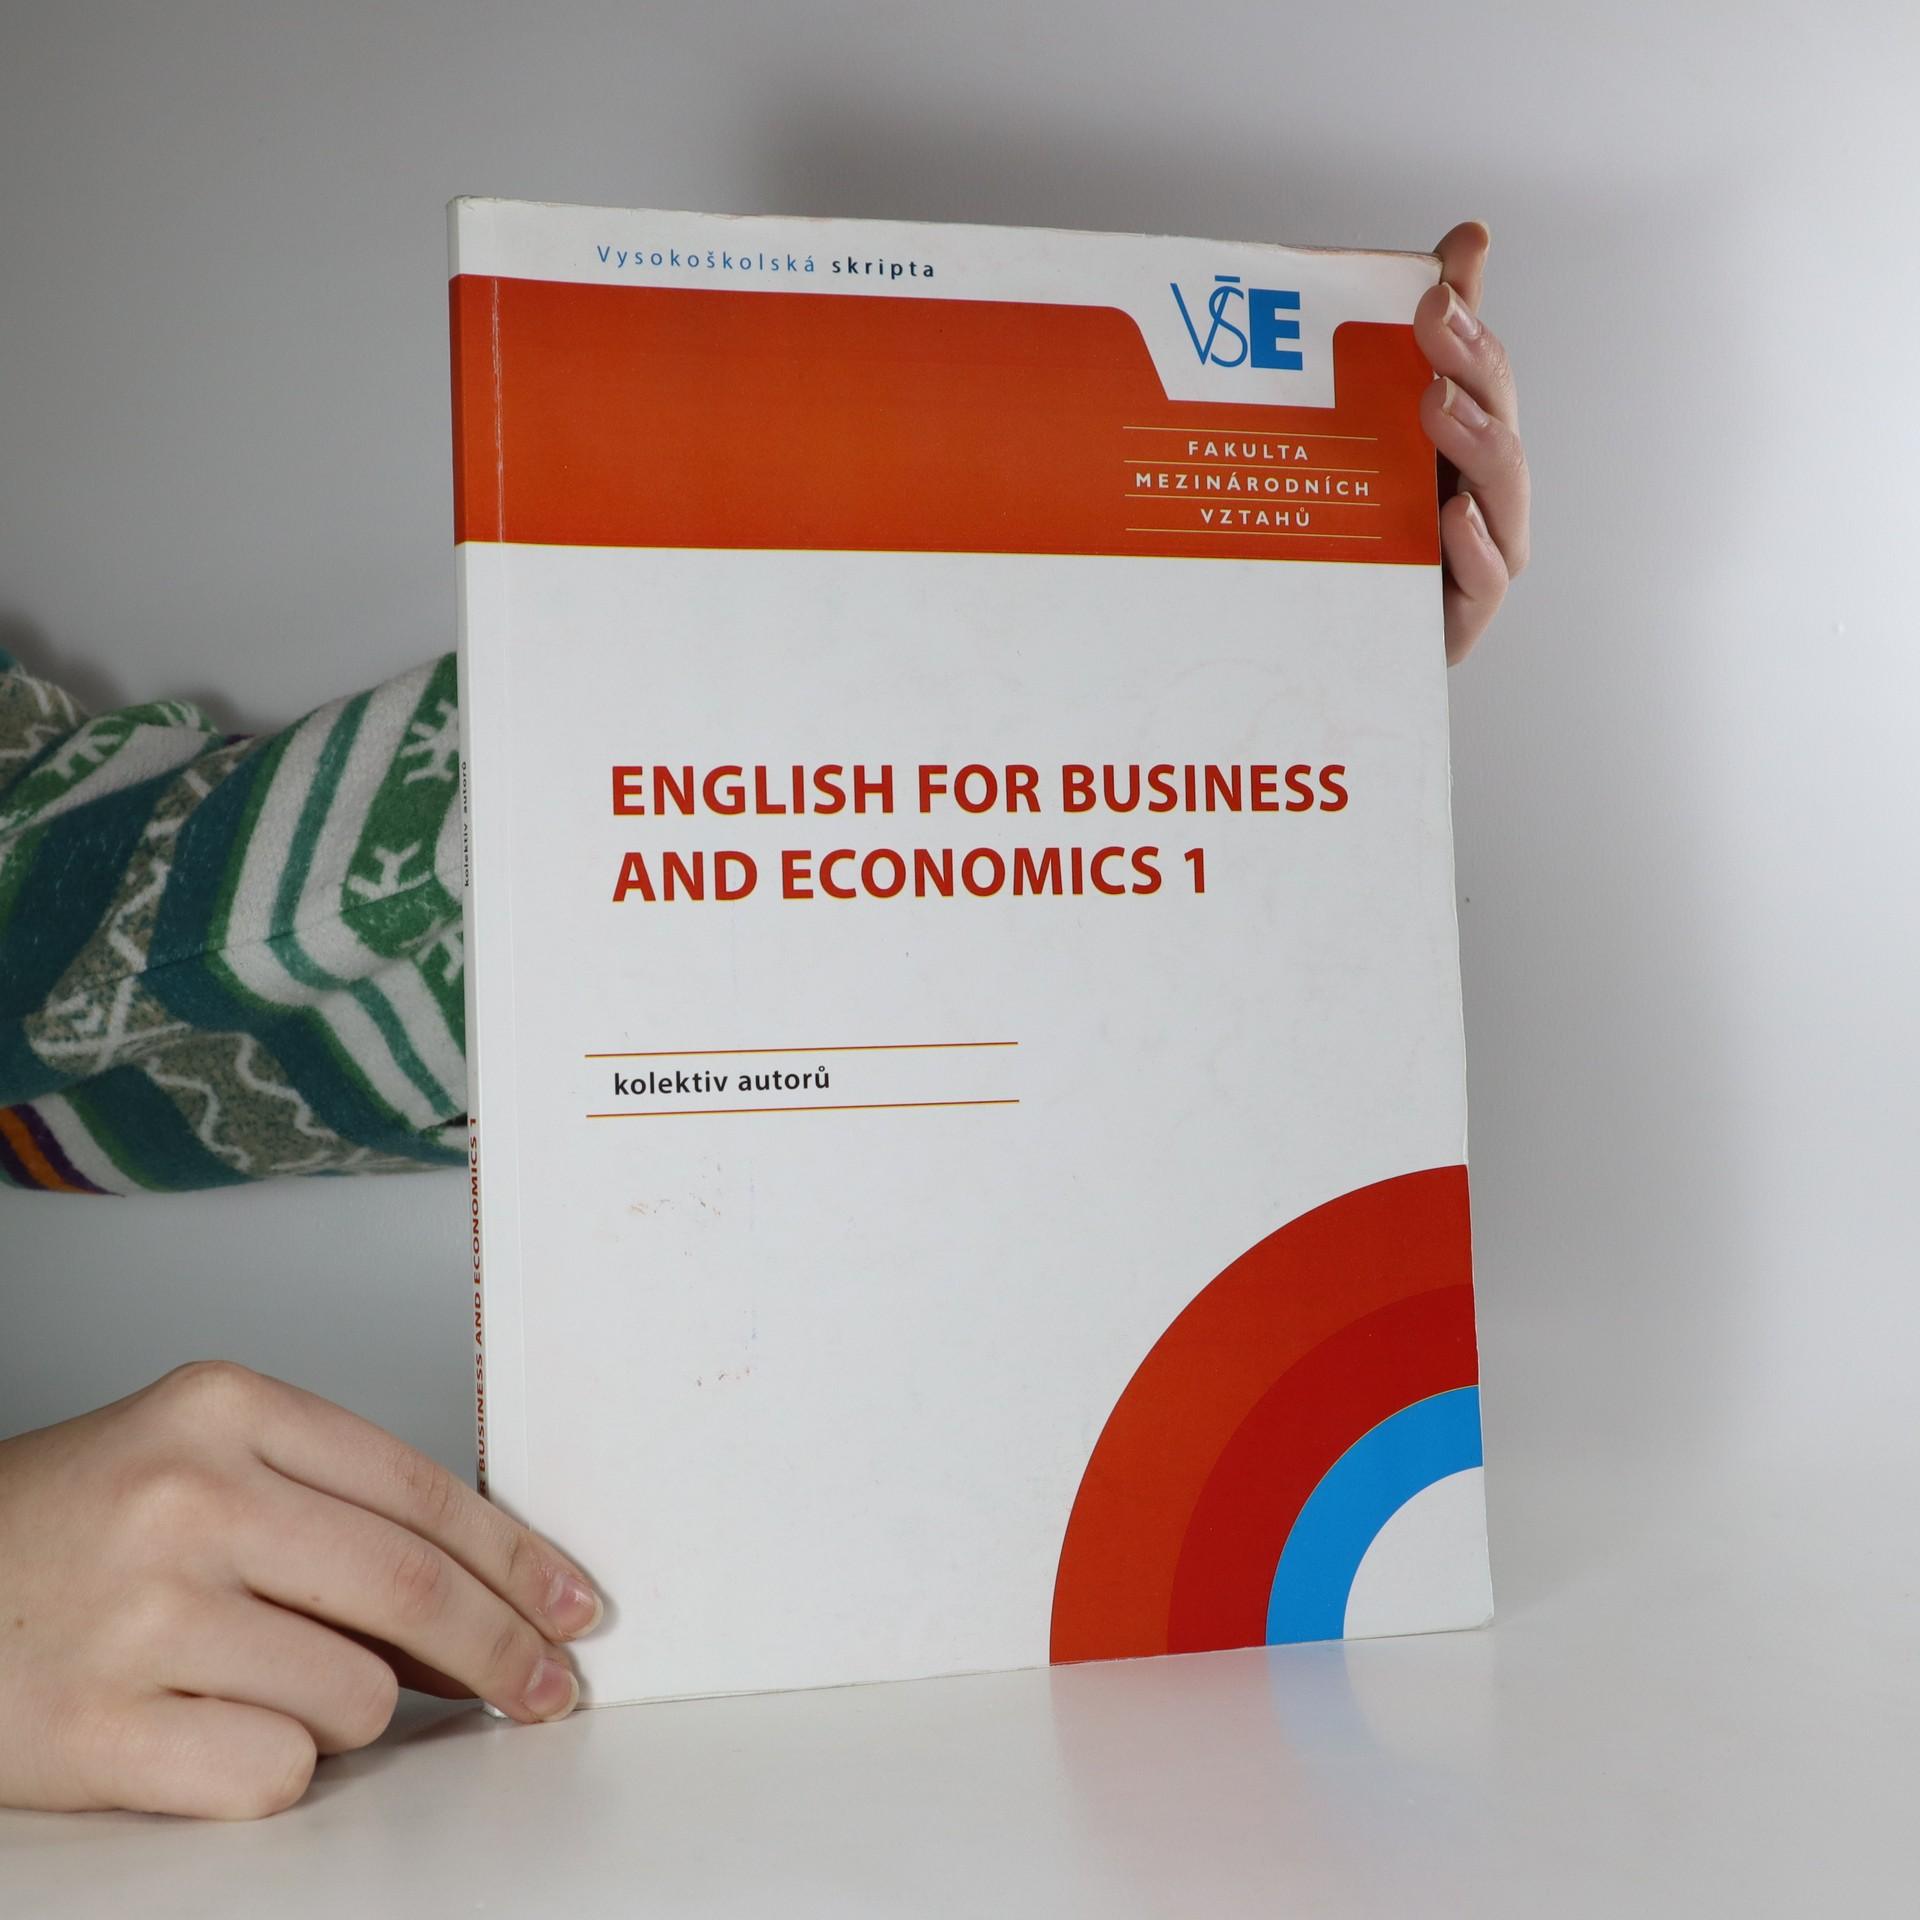 antikvární kniha English for business and economics 1, neuveden